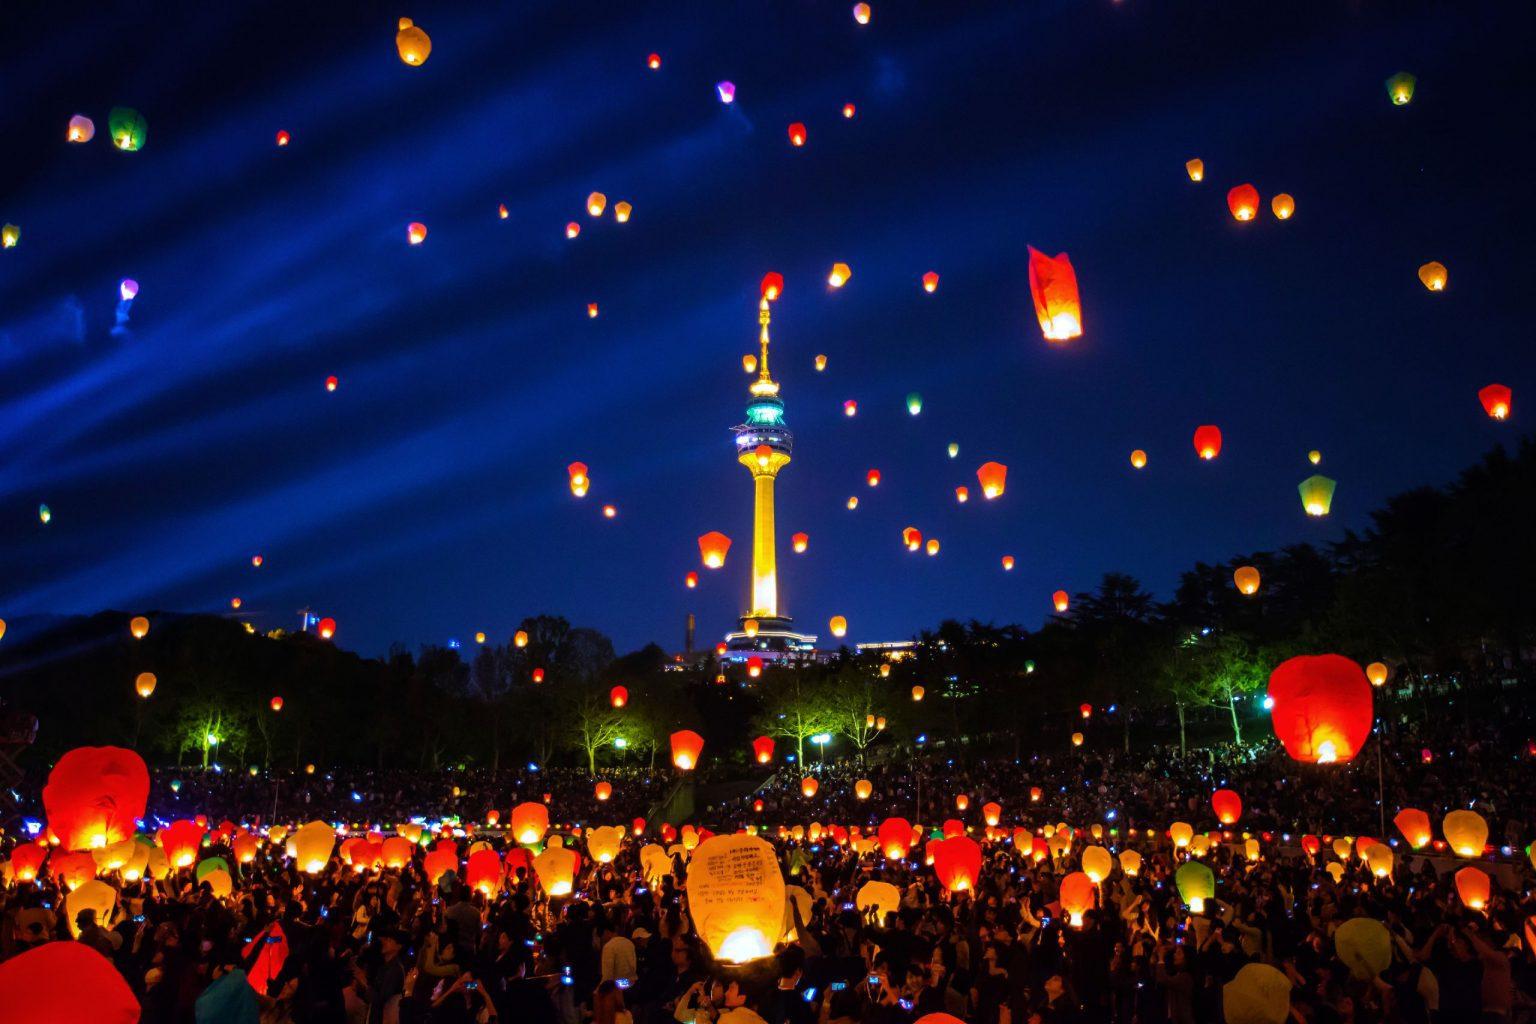 Buddha's birthday: Lantern festival lights up Korea | KoreabyMe